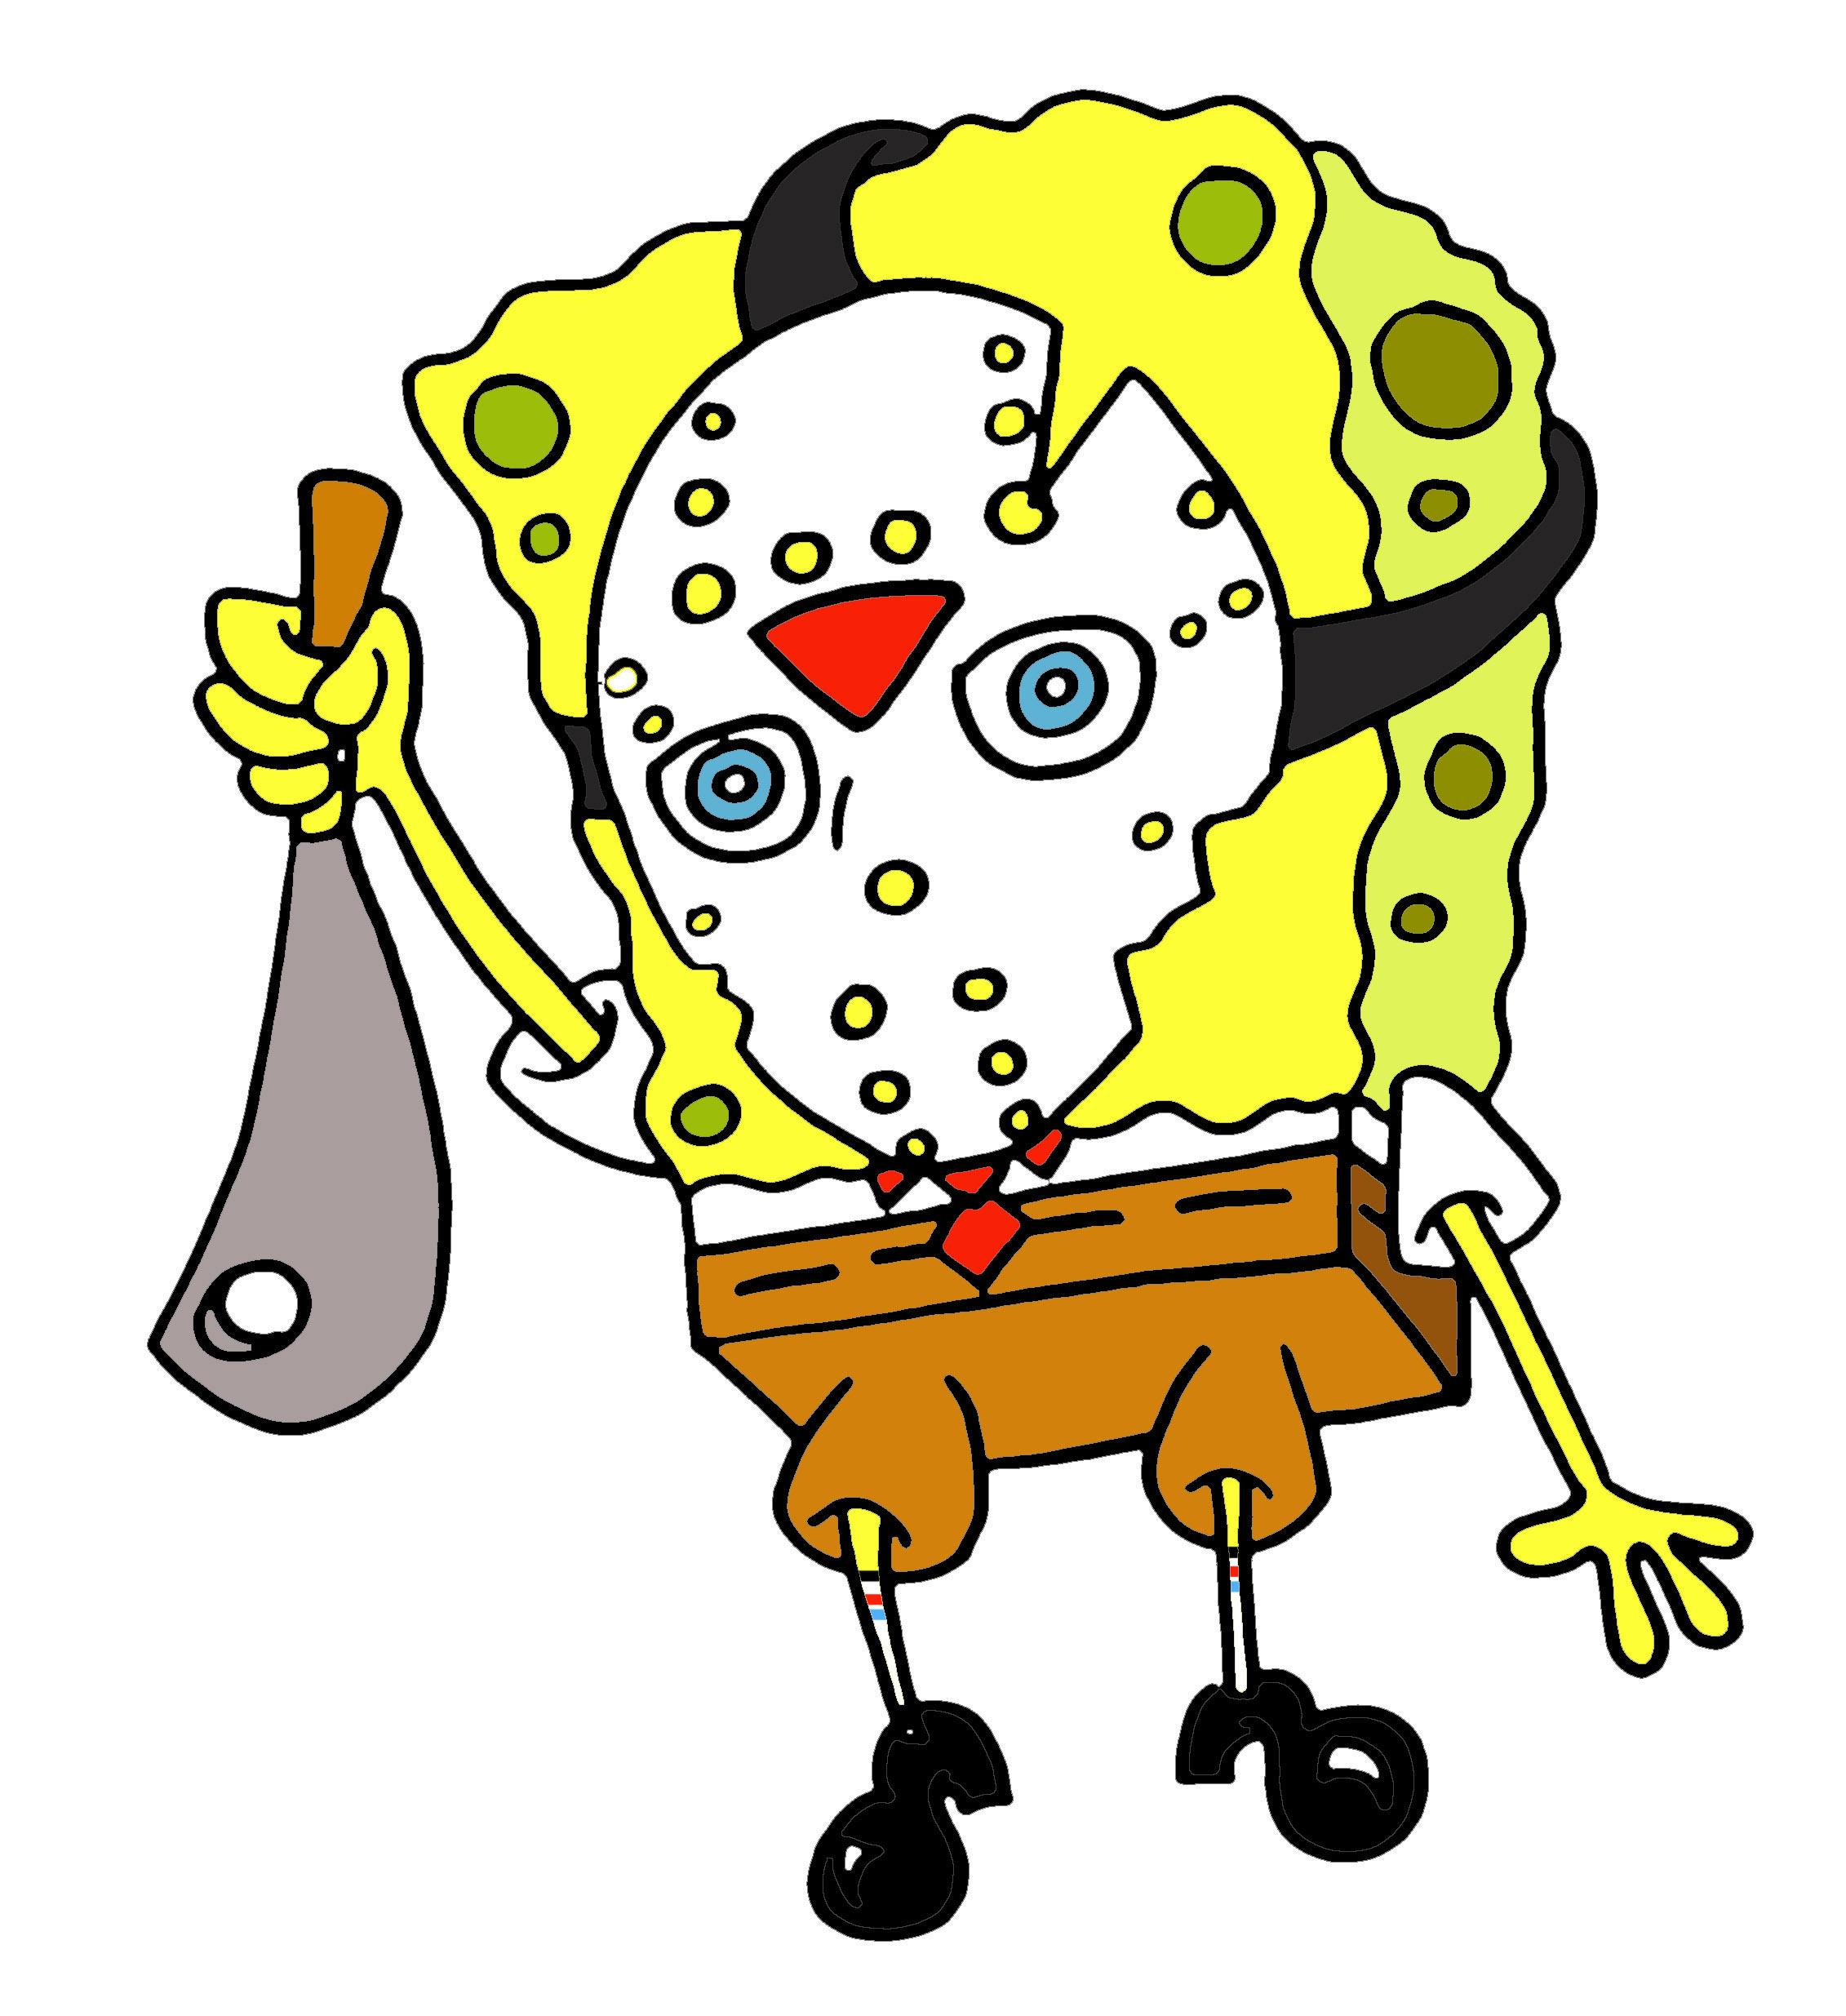 Clipart spongebob squarepants clipartfox - WikiClipArt